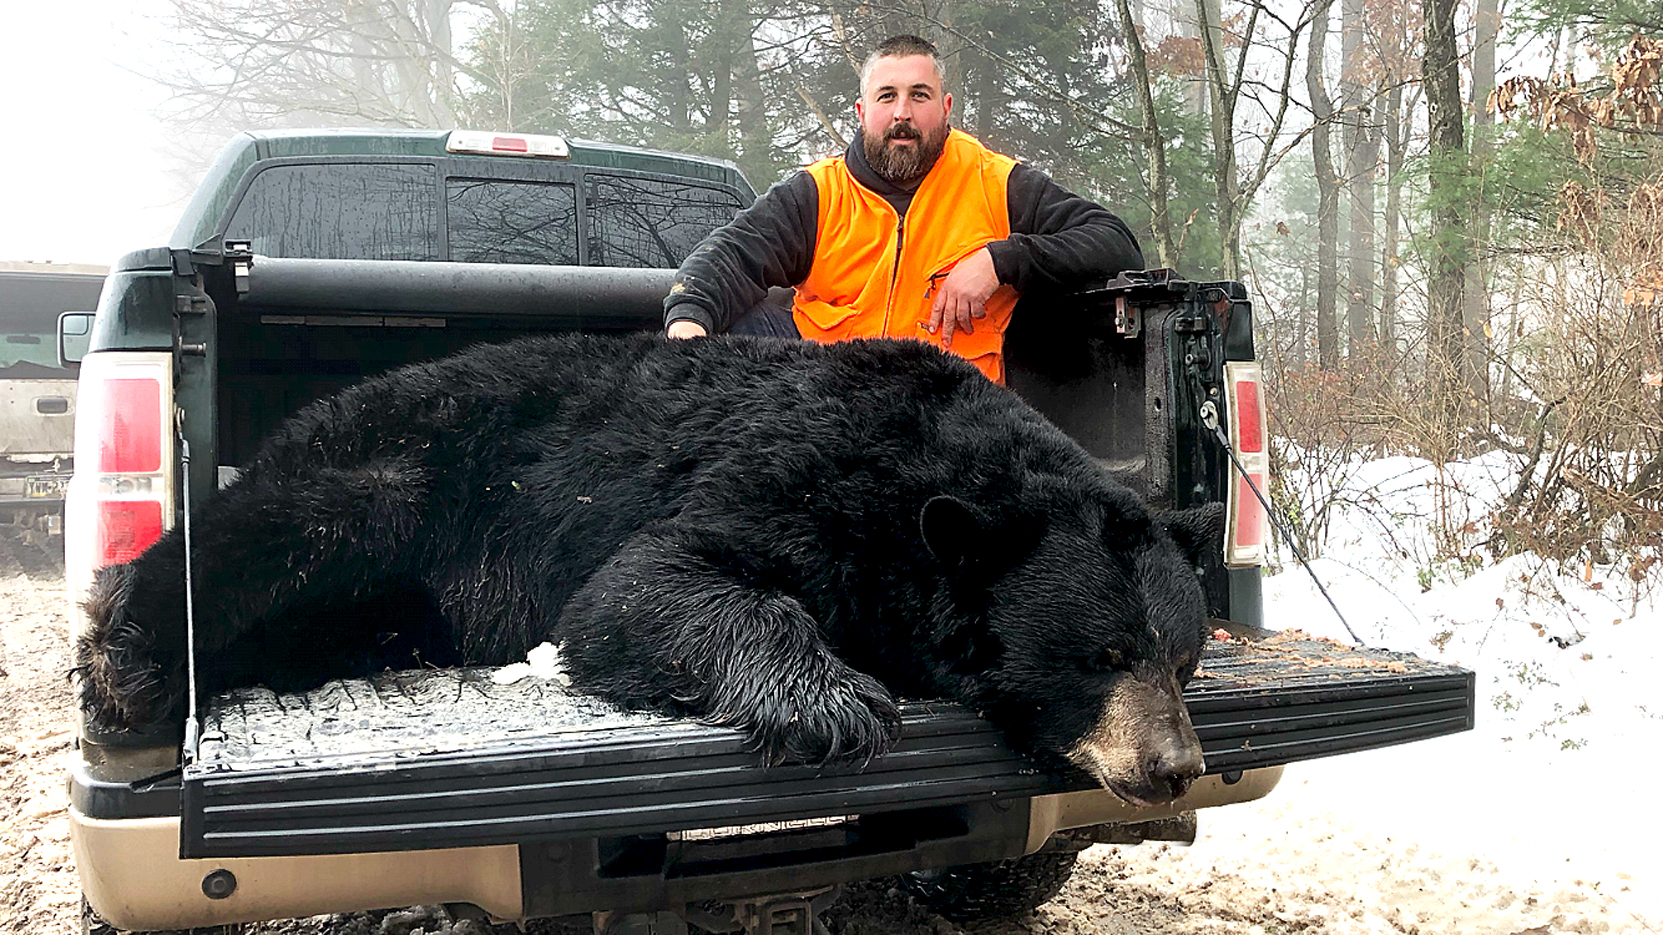 Clinton County bear kills remain at top with 119   News, Sports, Jobs